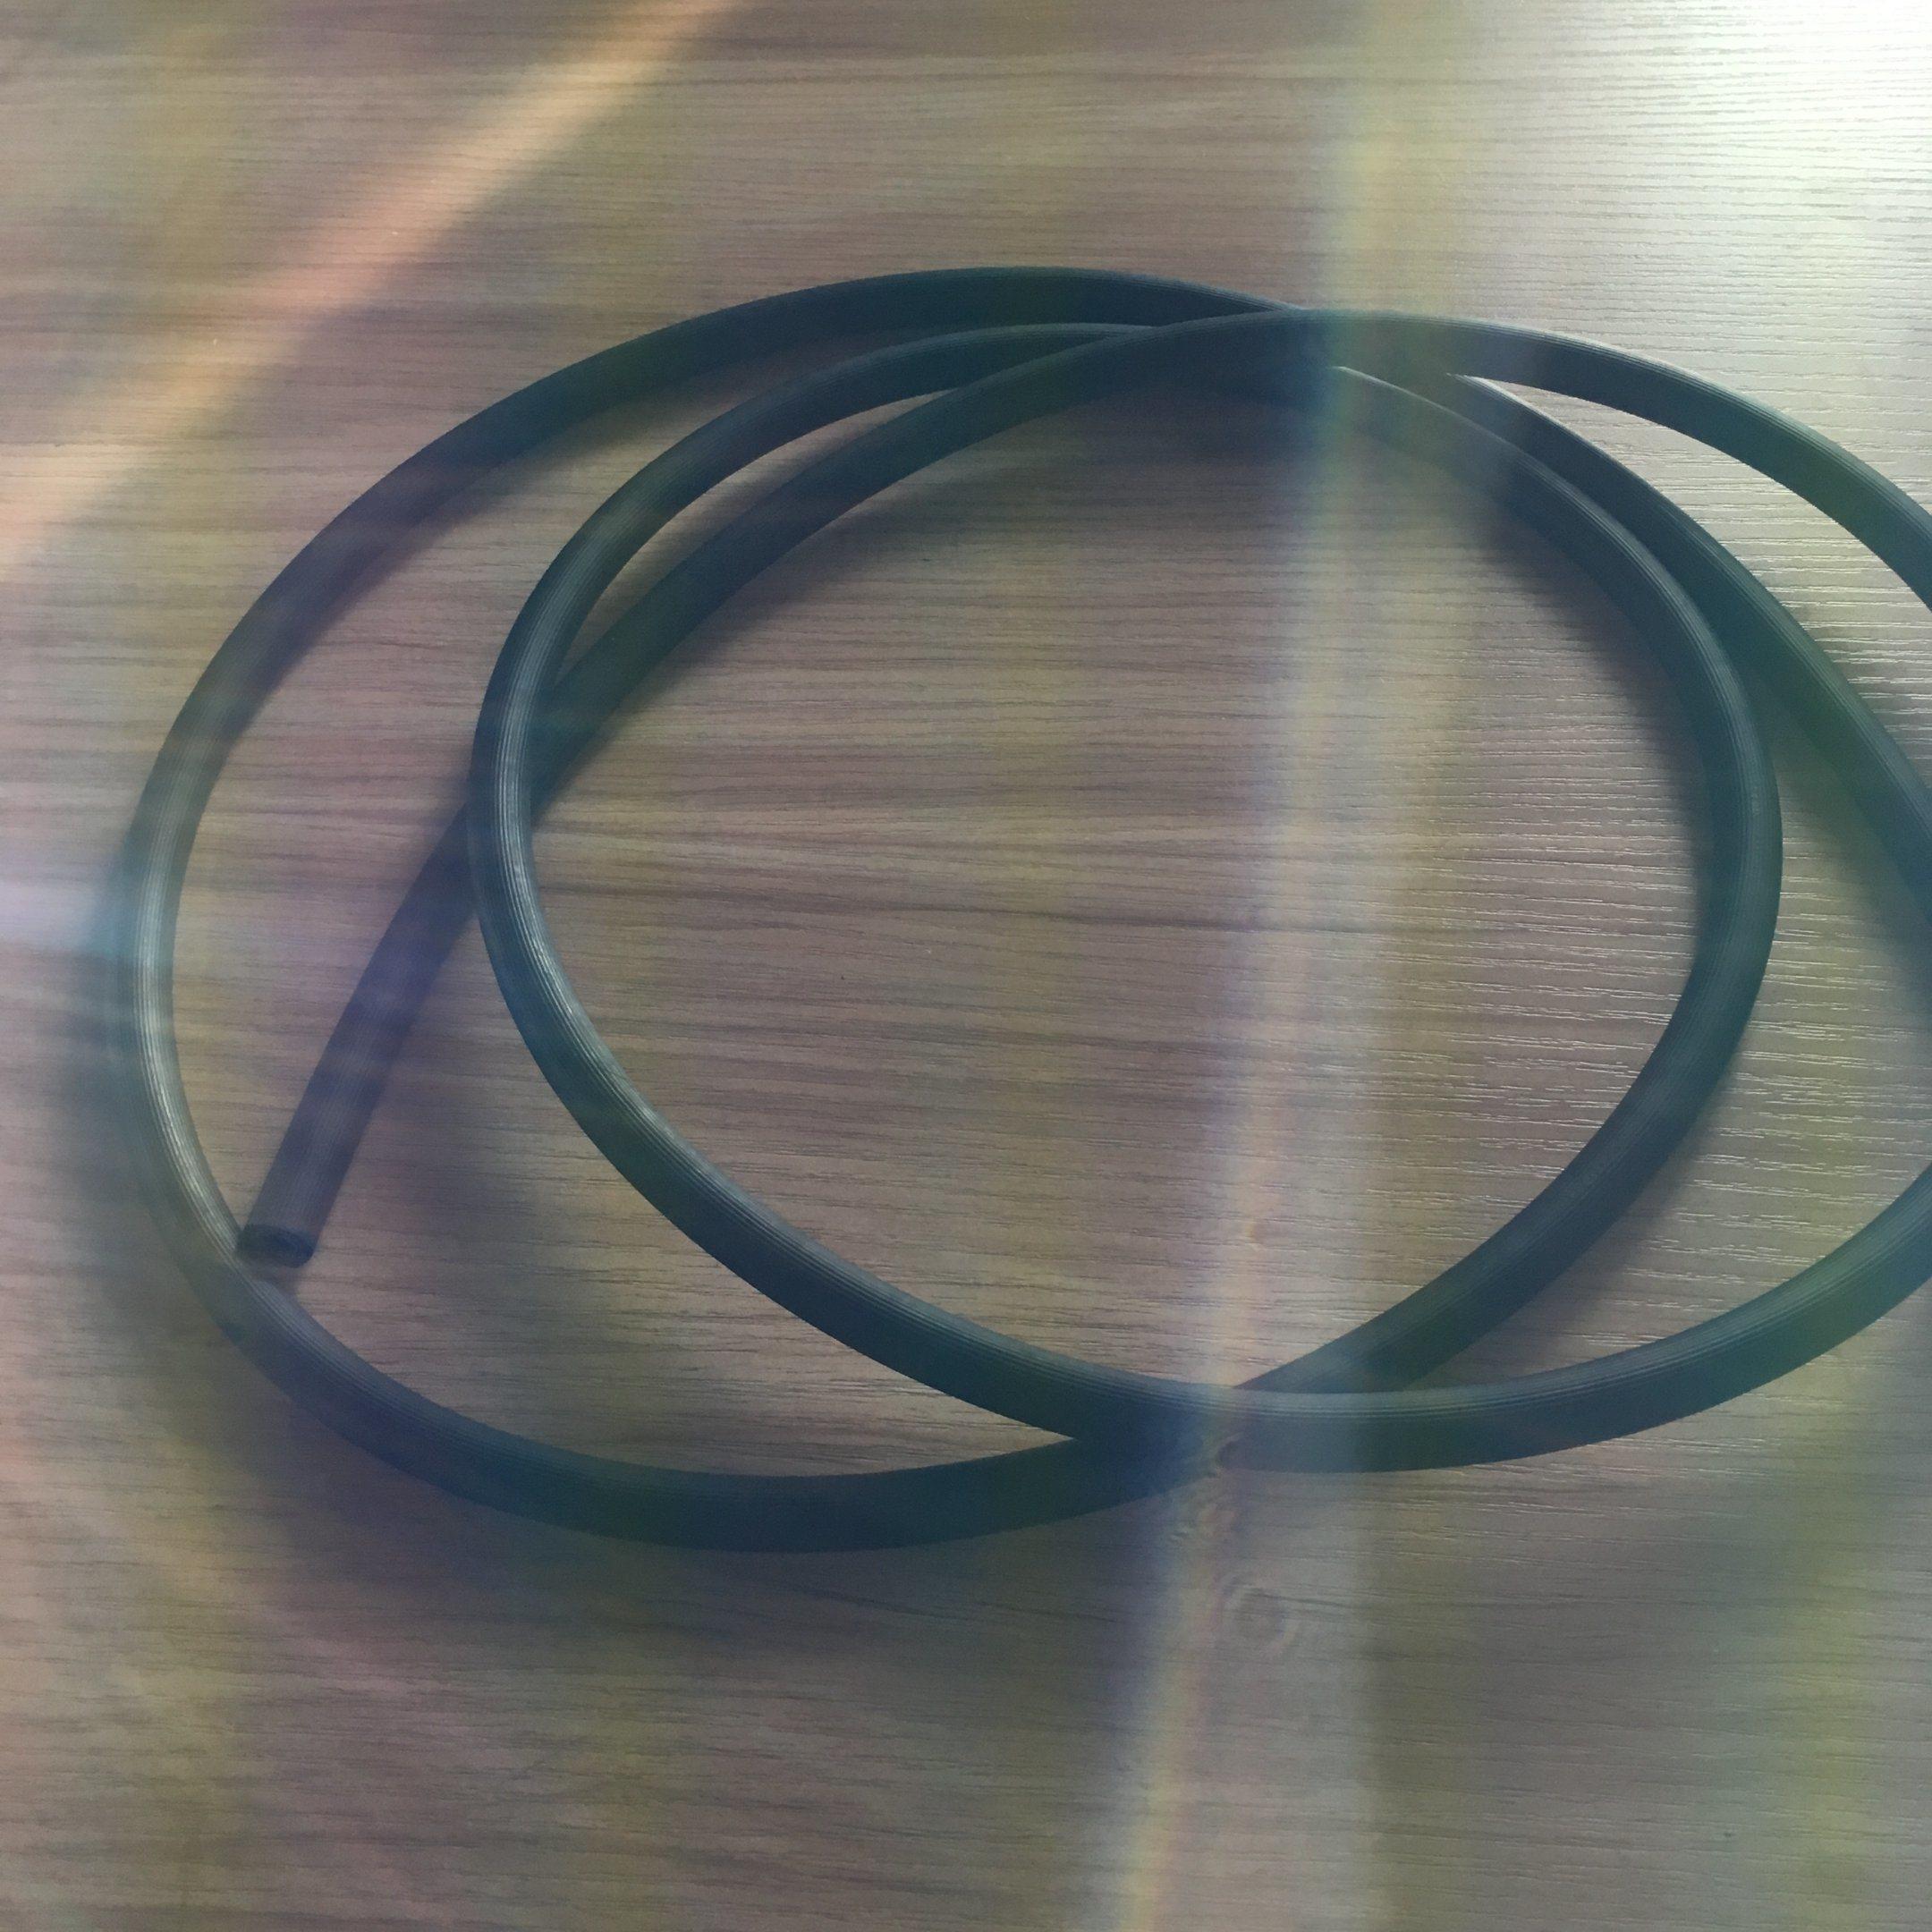 Manufactory factory auto braid